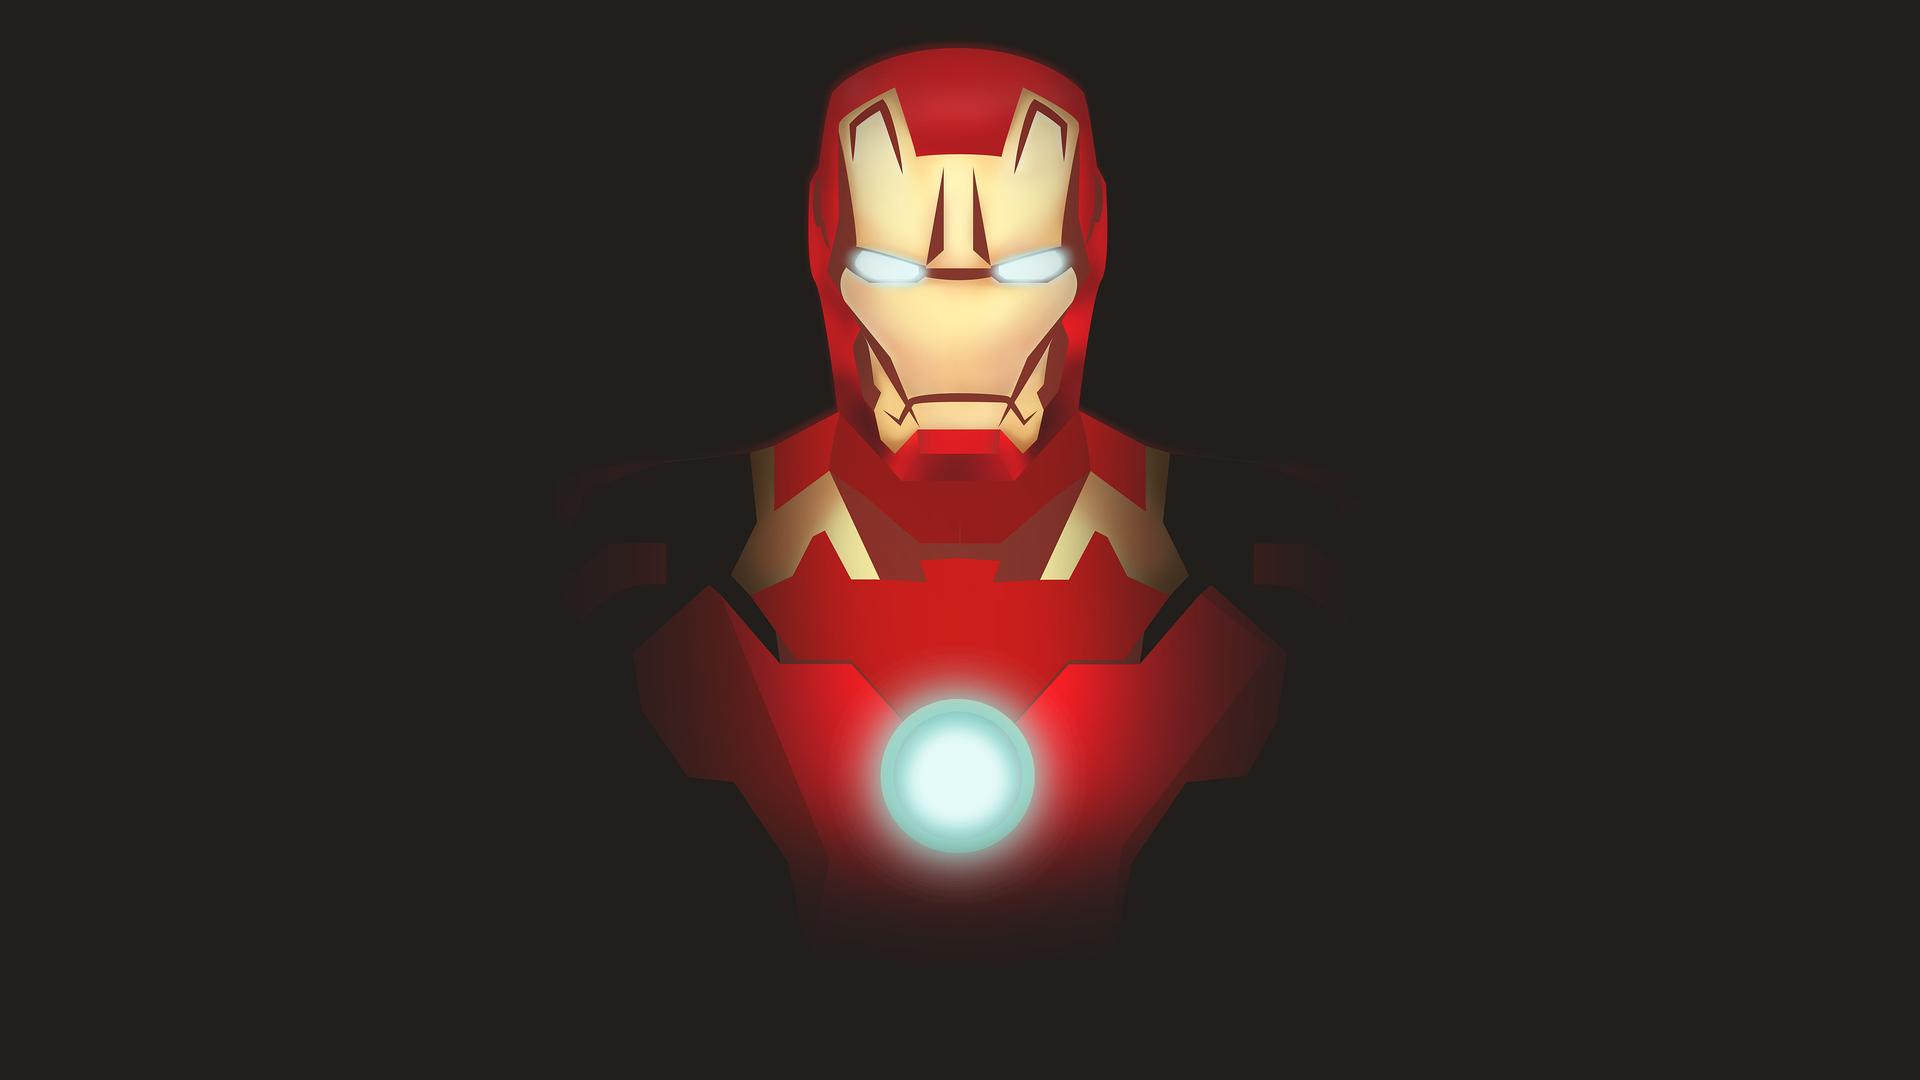 1920x1080 Iron Man Illustration Laptop Full Hd 1080p Hd 4k